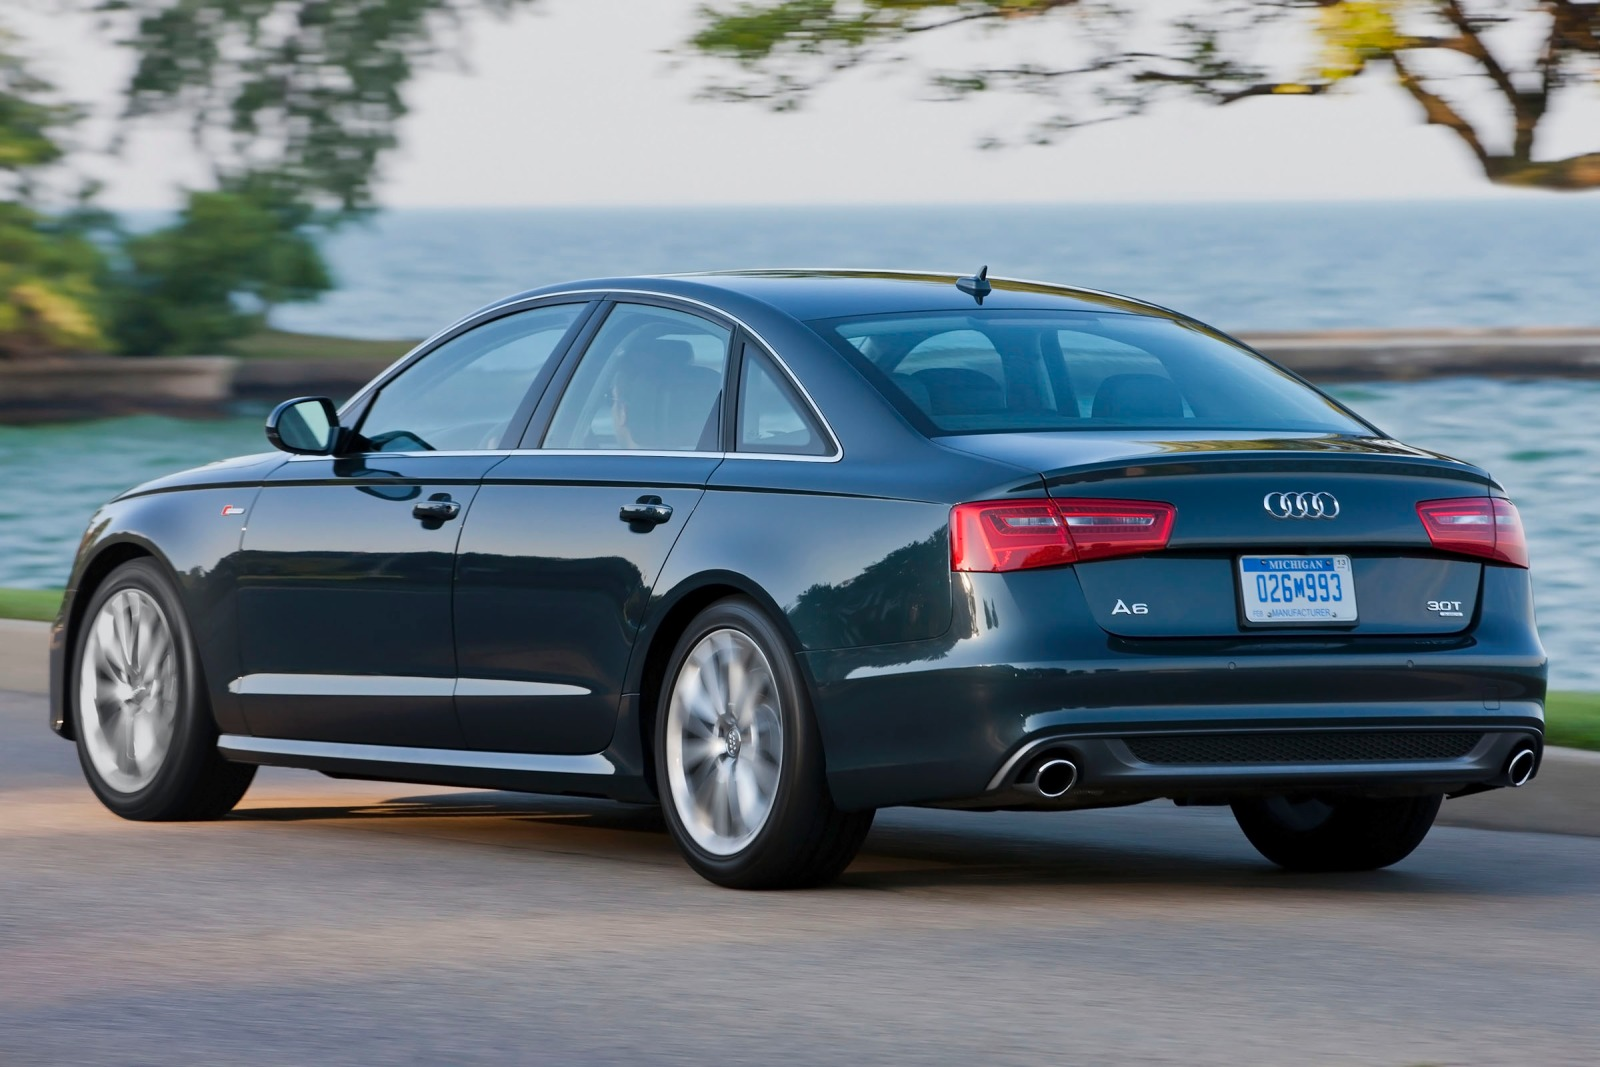 2012 Audi A6 Image 9